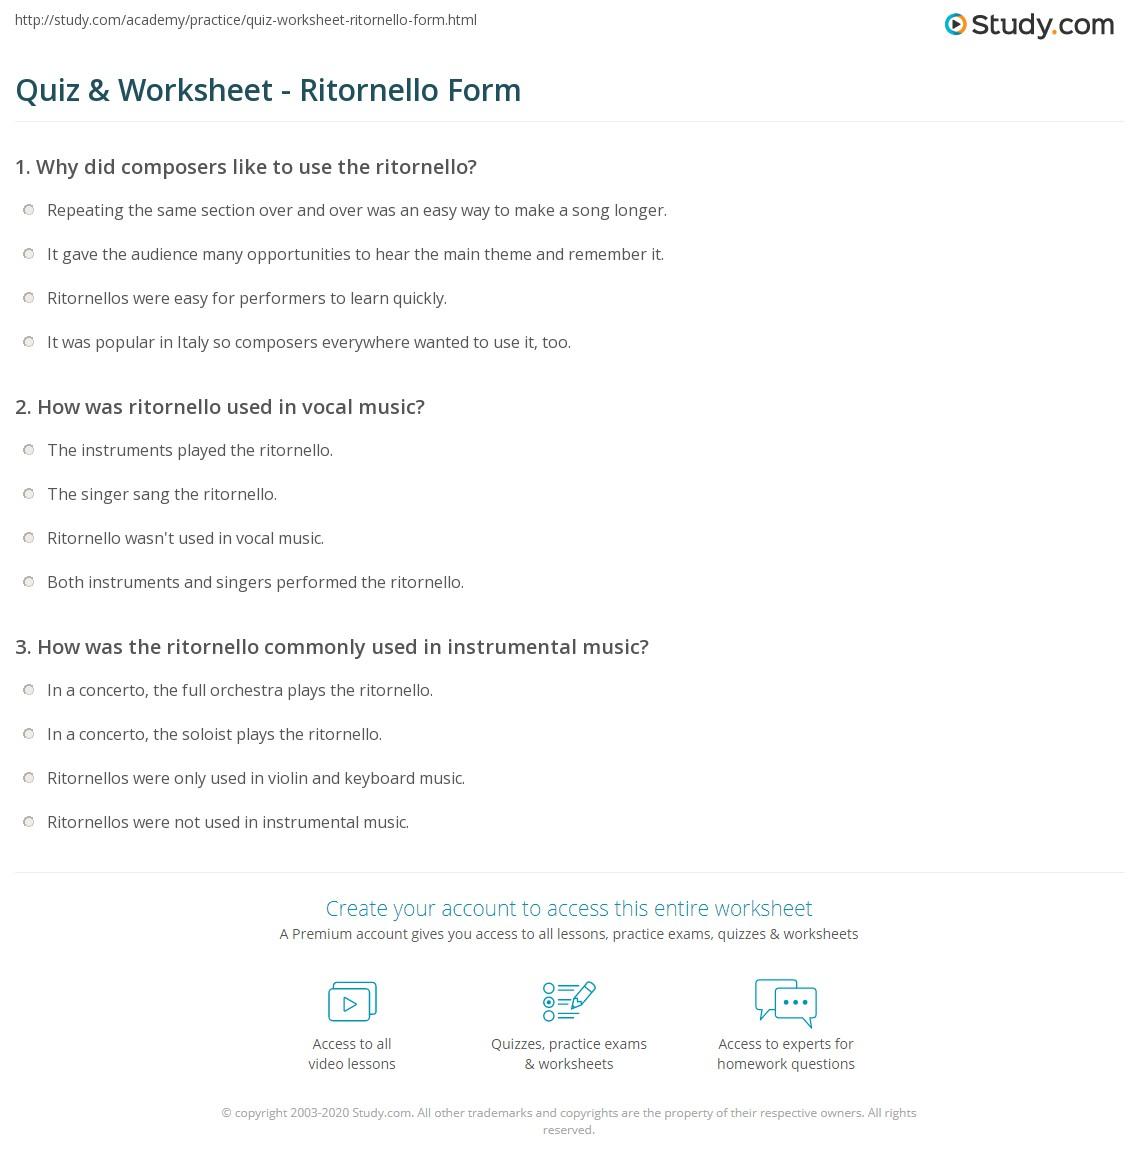 Quiz & Worksheet - Ritornello Form | Study.com